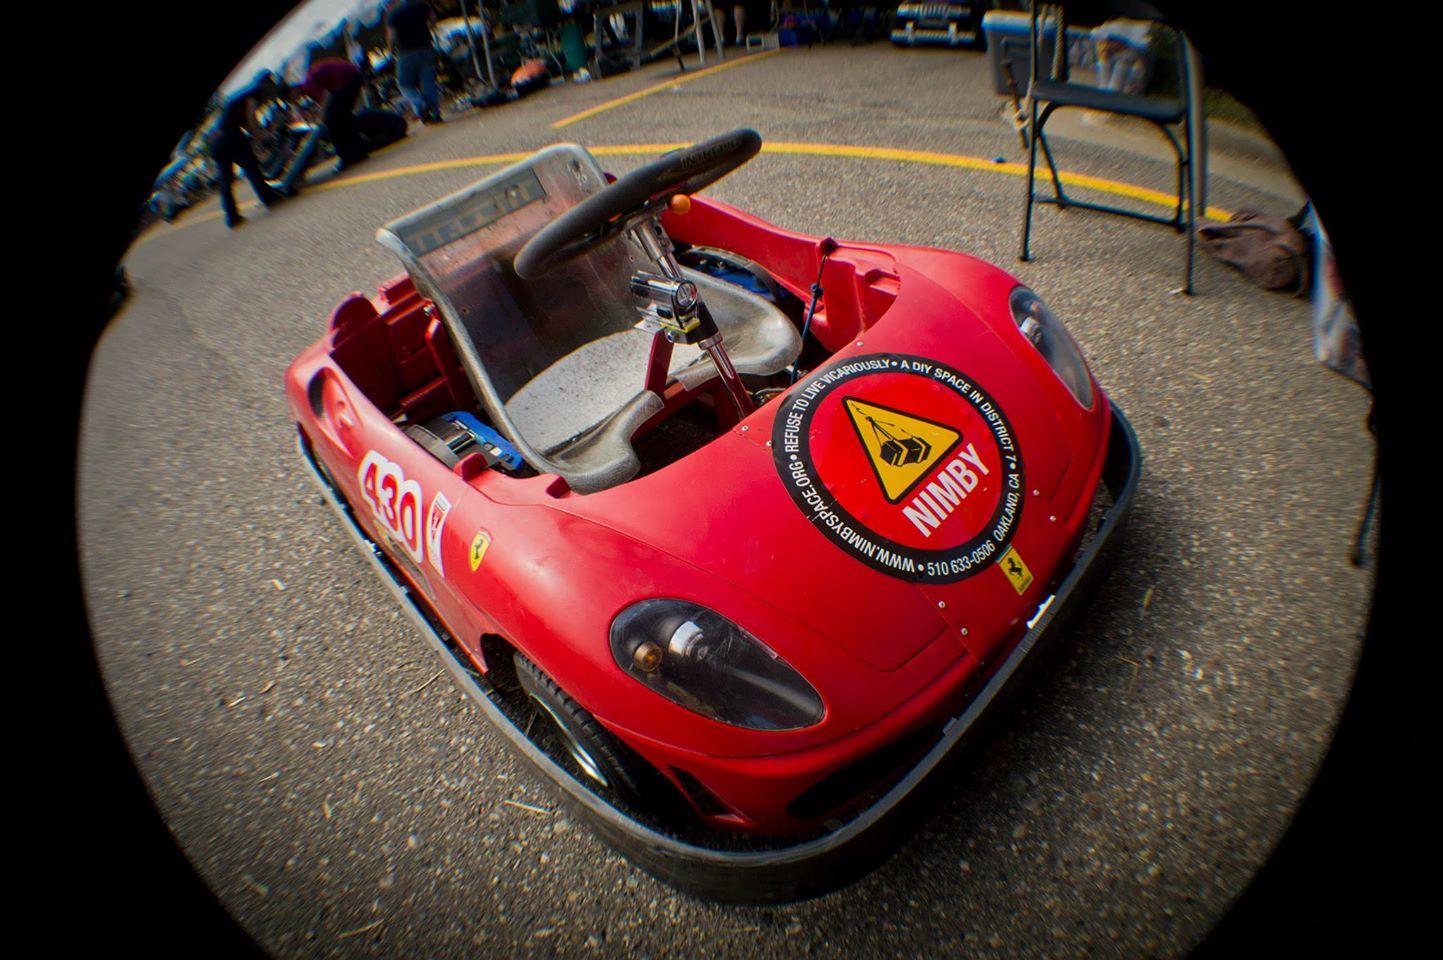 Inside Power Racing Series' Pit Row